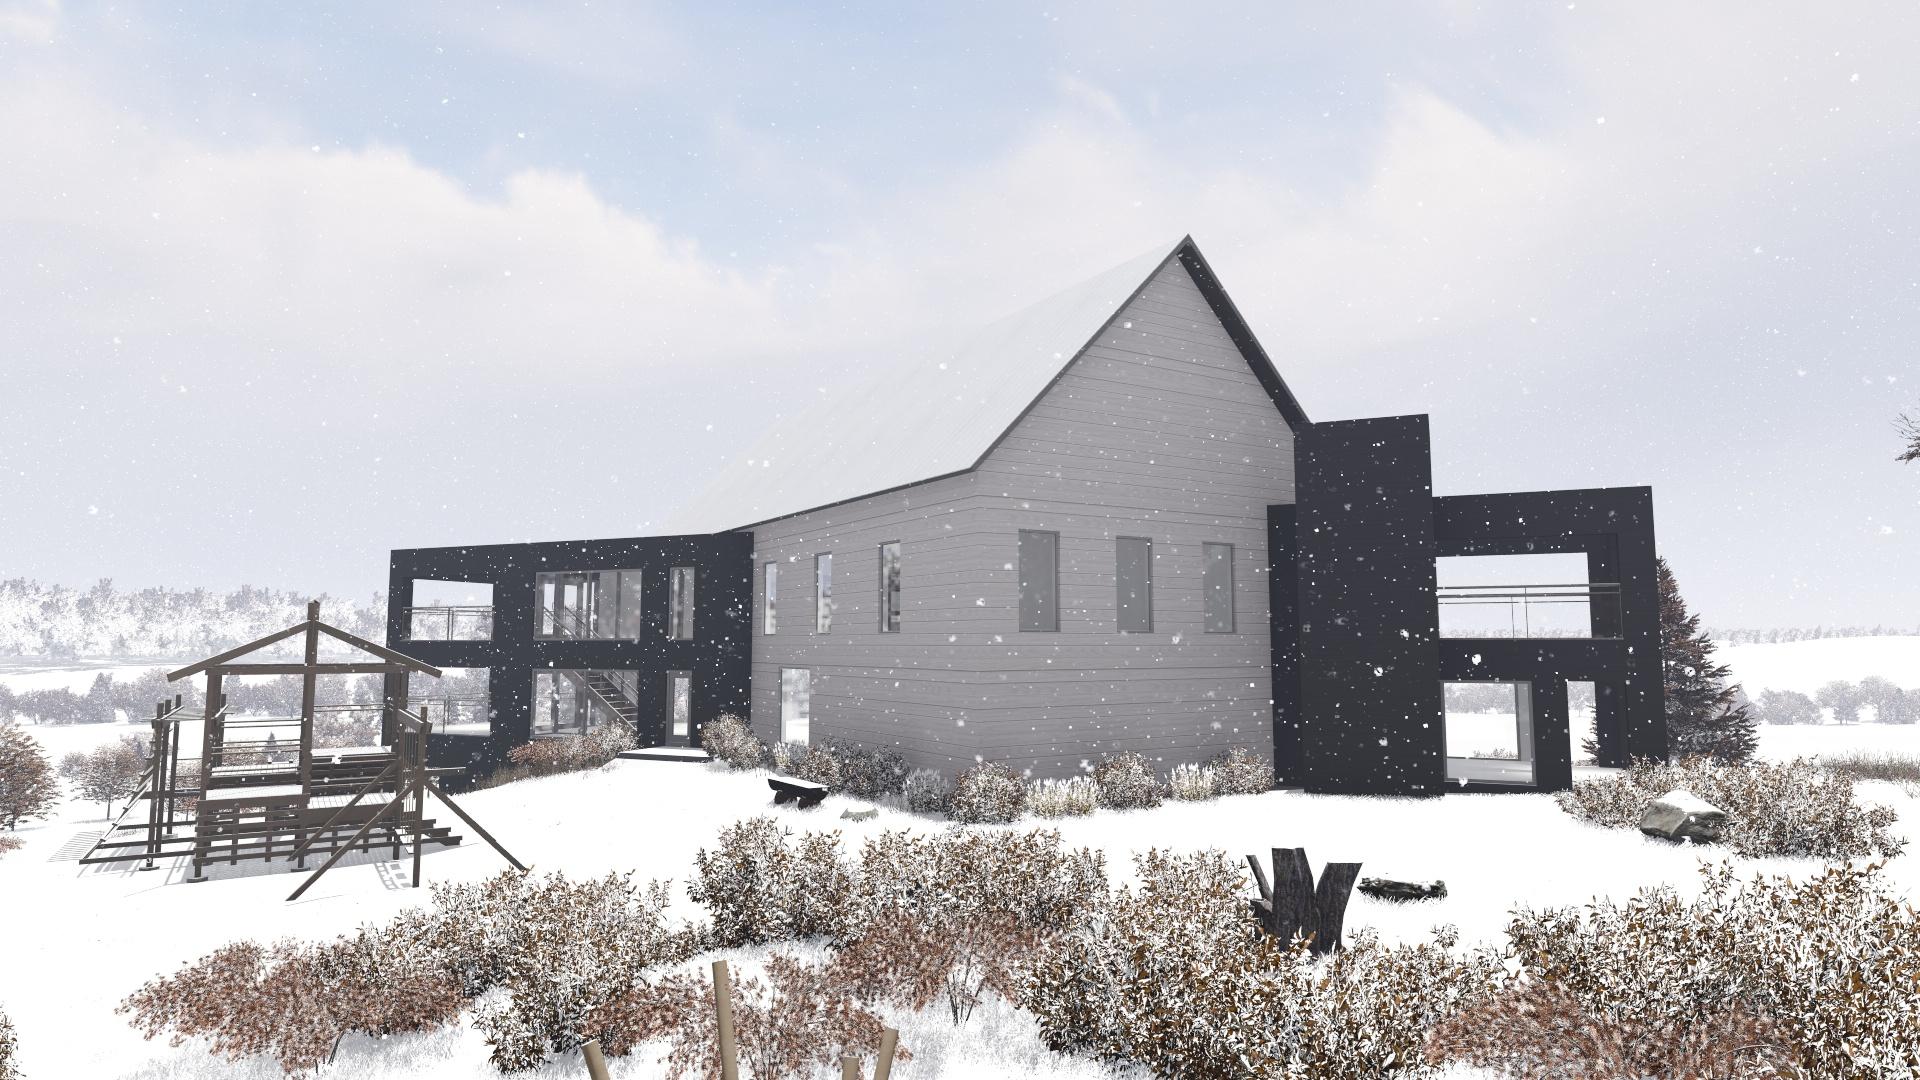 Kimbercote Accommodations Building - 008B - Winter.jpg